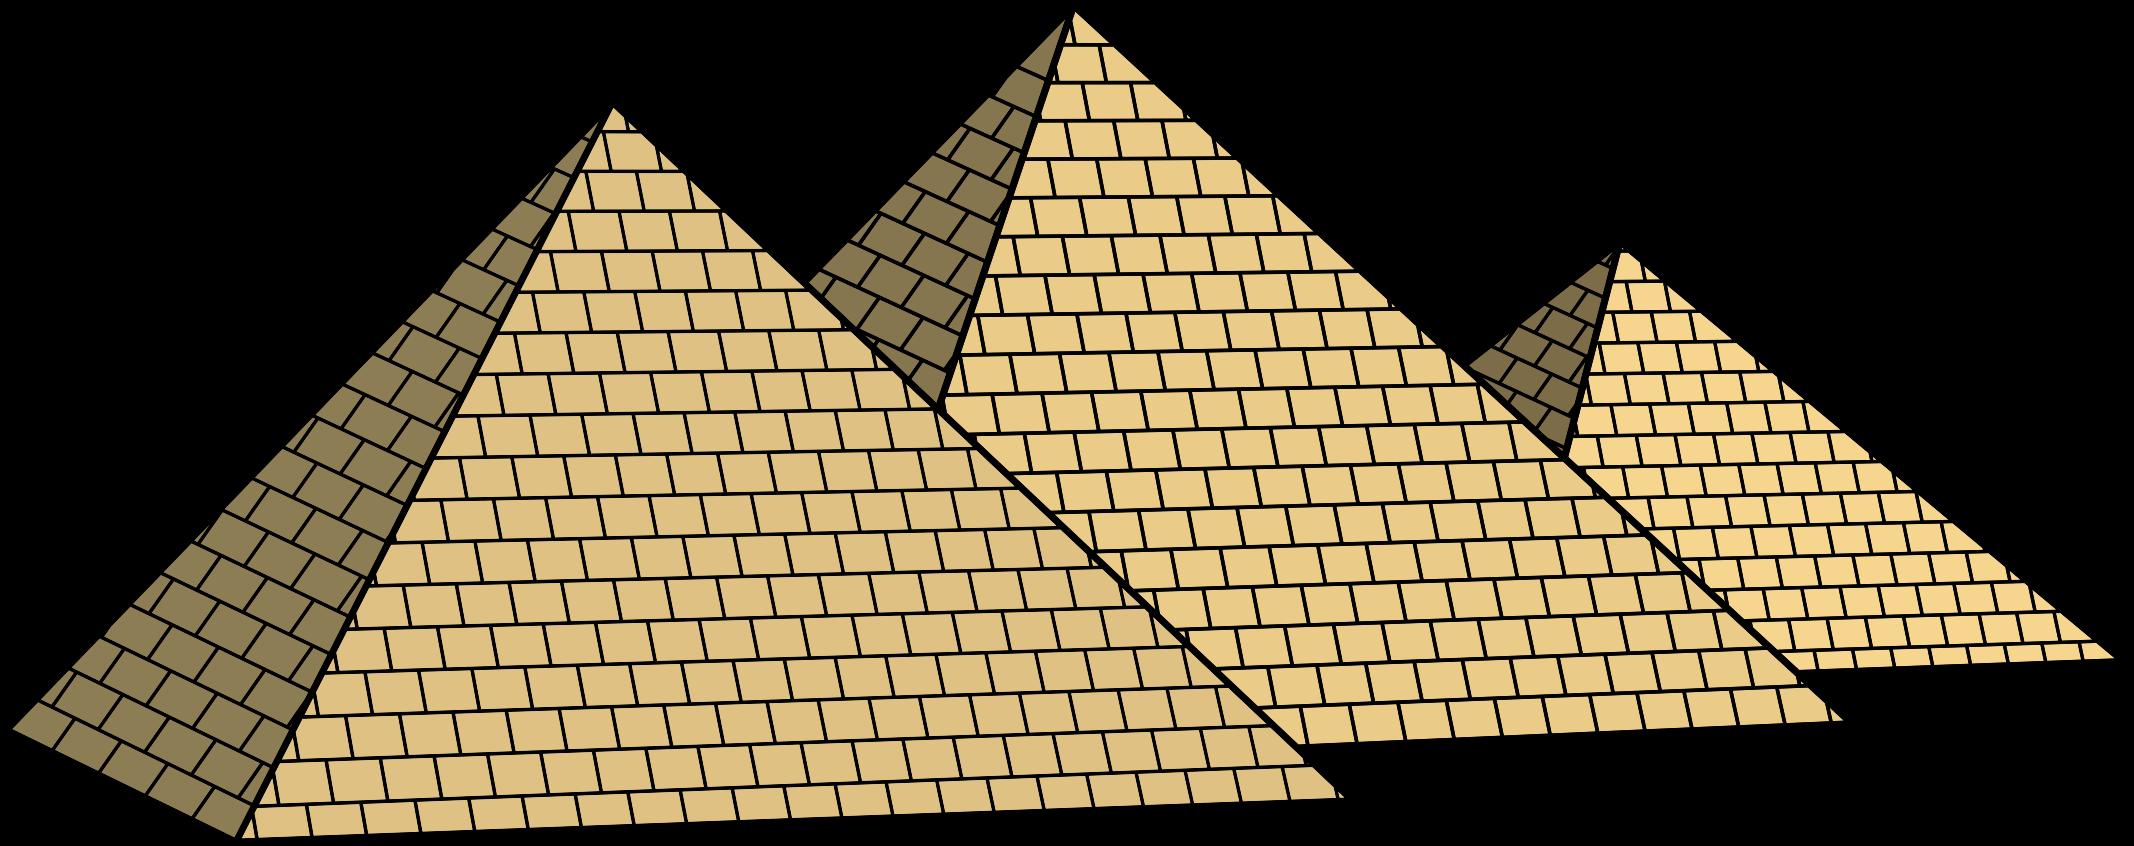 Egyptian Pyramid PNG - 62137